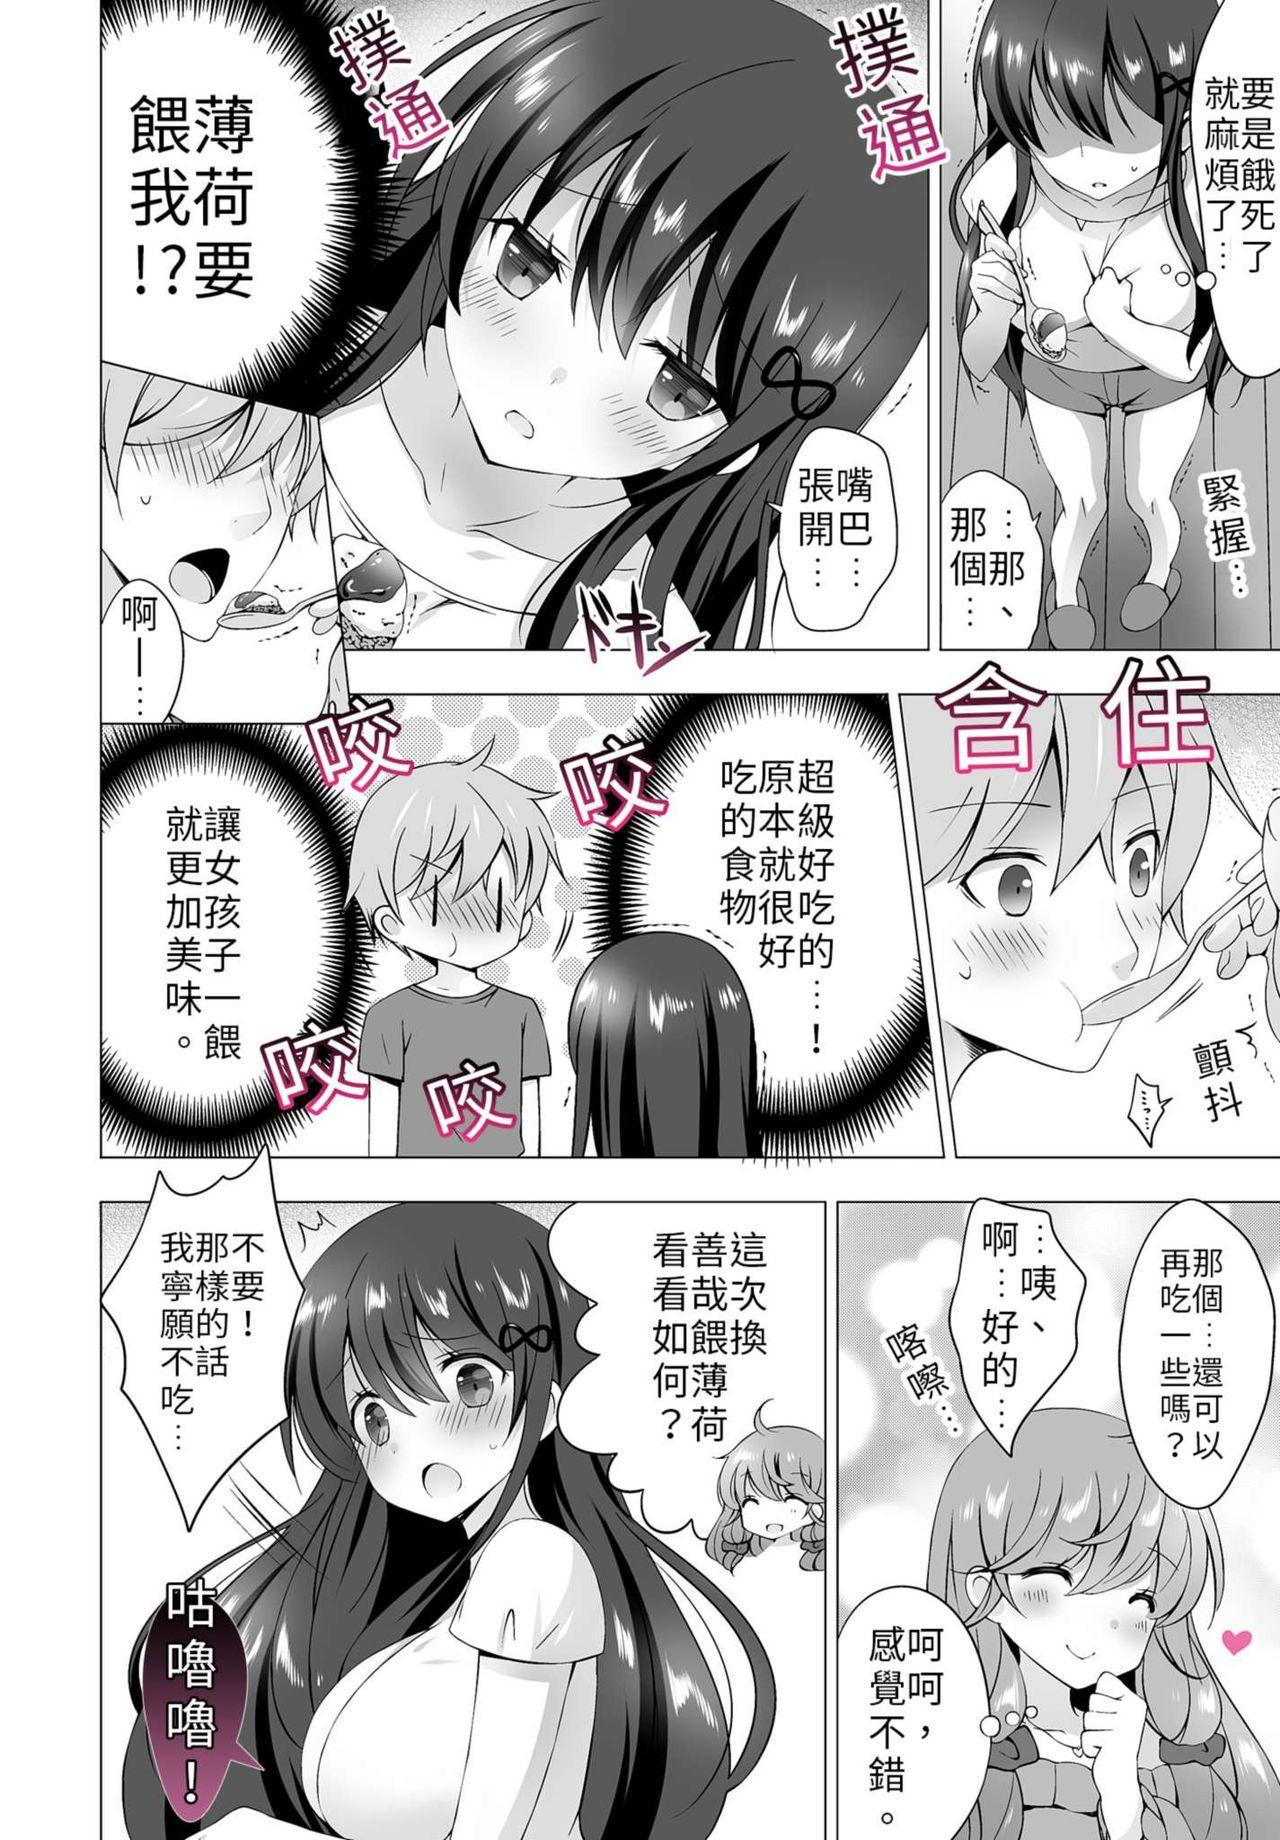 [vanilla] 4LDK Shimai Tsuki ~Muichimon OK, Tadashi Doutei ni Kagiru | 四房一衛一廳附姊妹 ~身無分文OK,但僅限處男~ Ch. 2 [Chinese] 9